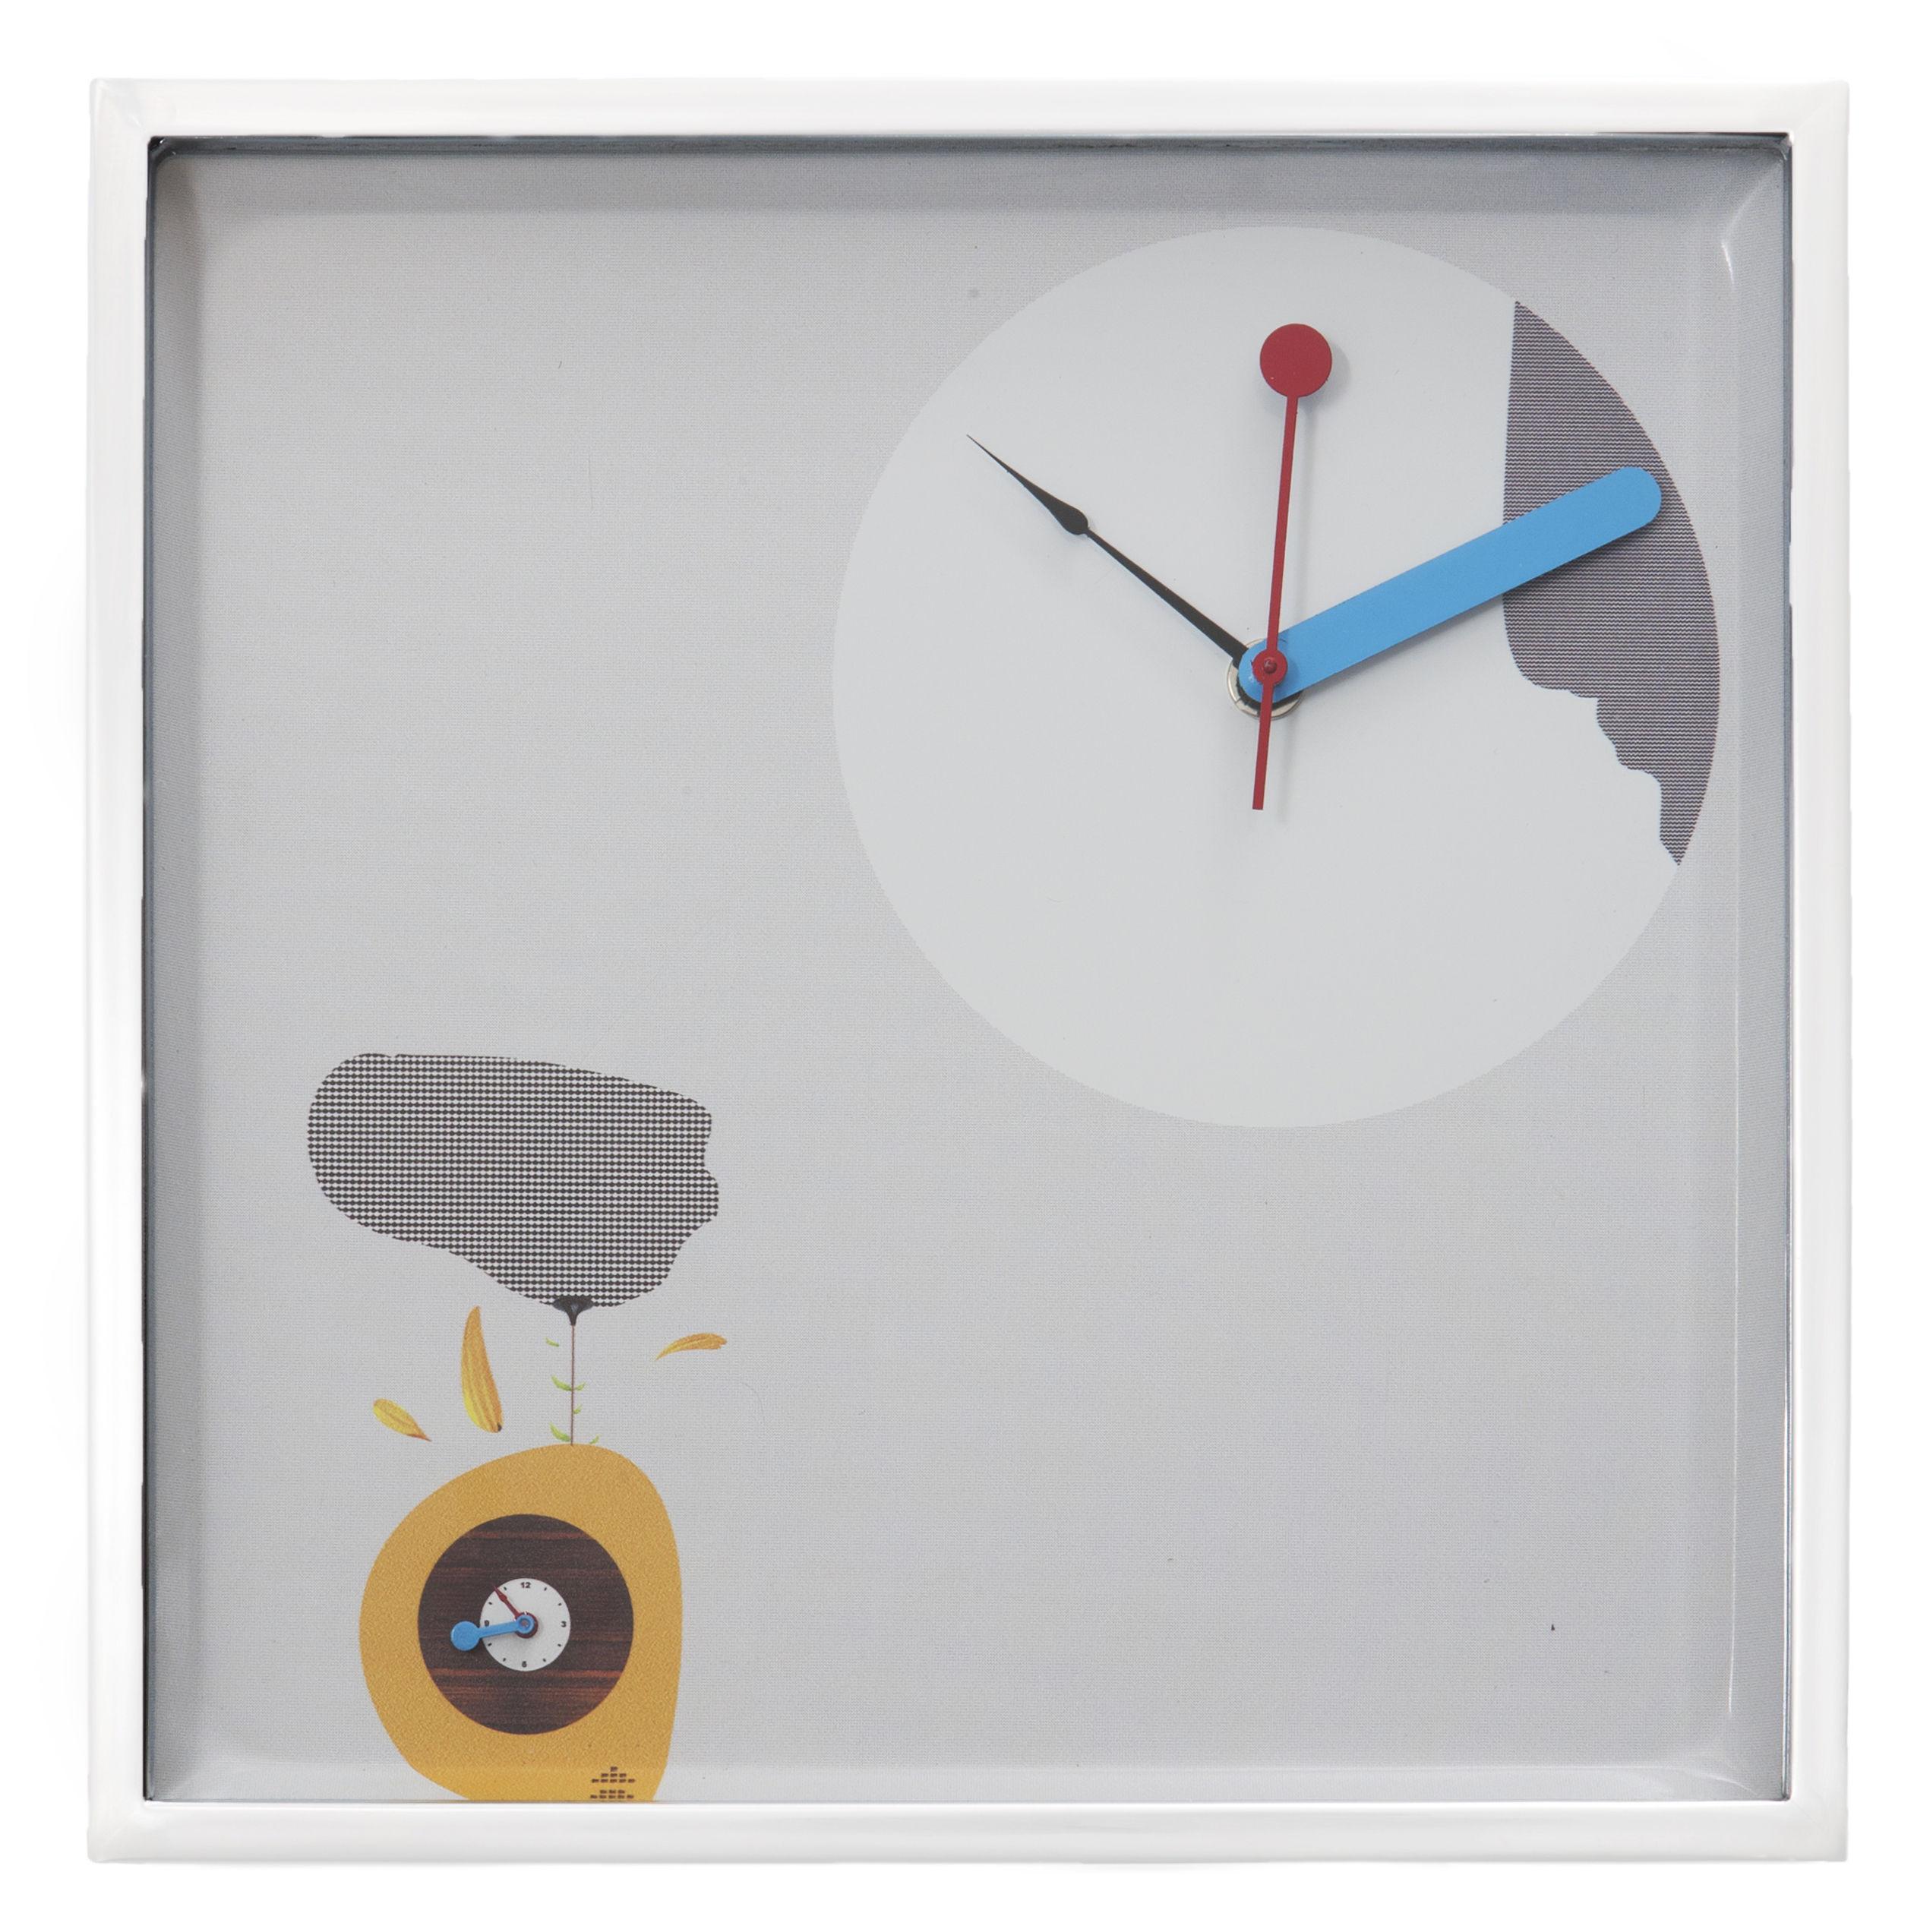 horloge murale magic hour carr e 28 x 28 cm carr e multicolore driade. Black Bedroom Furniture Sets. Home Design Ideas